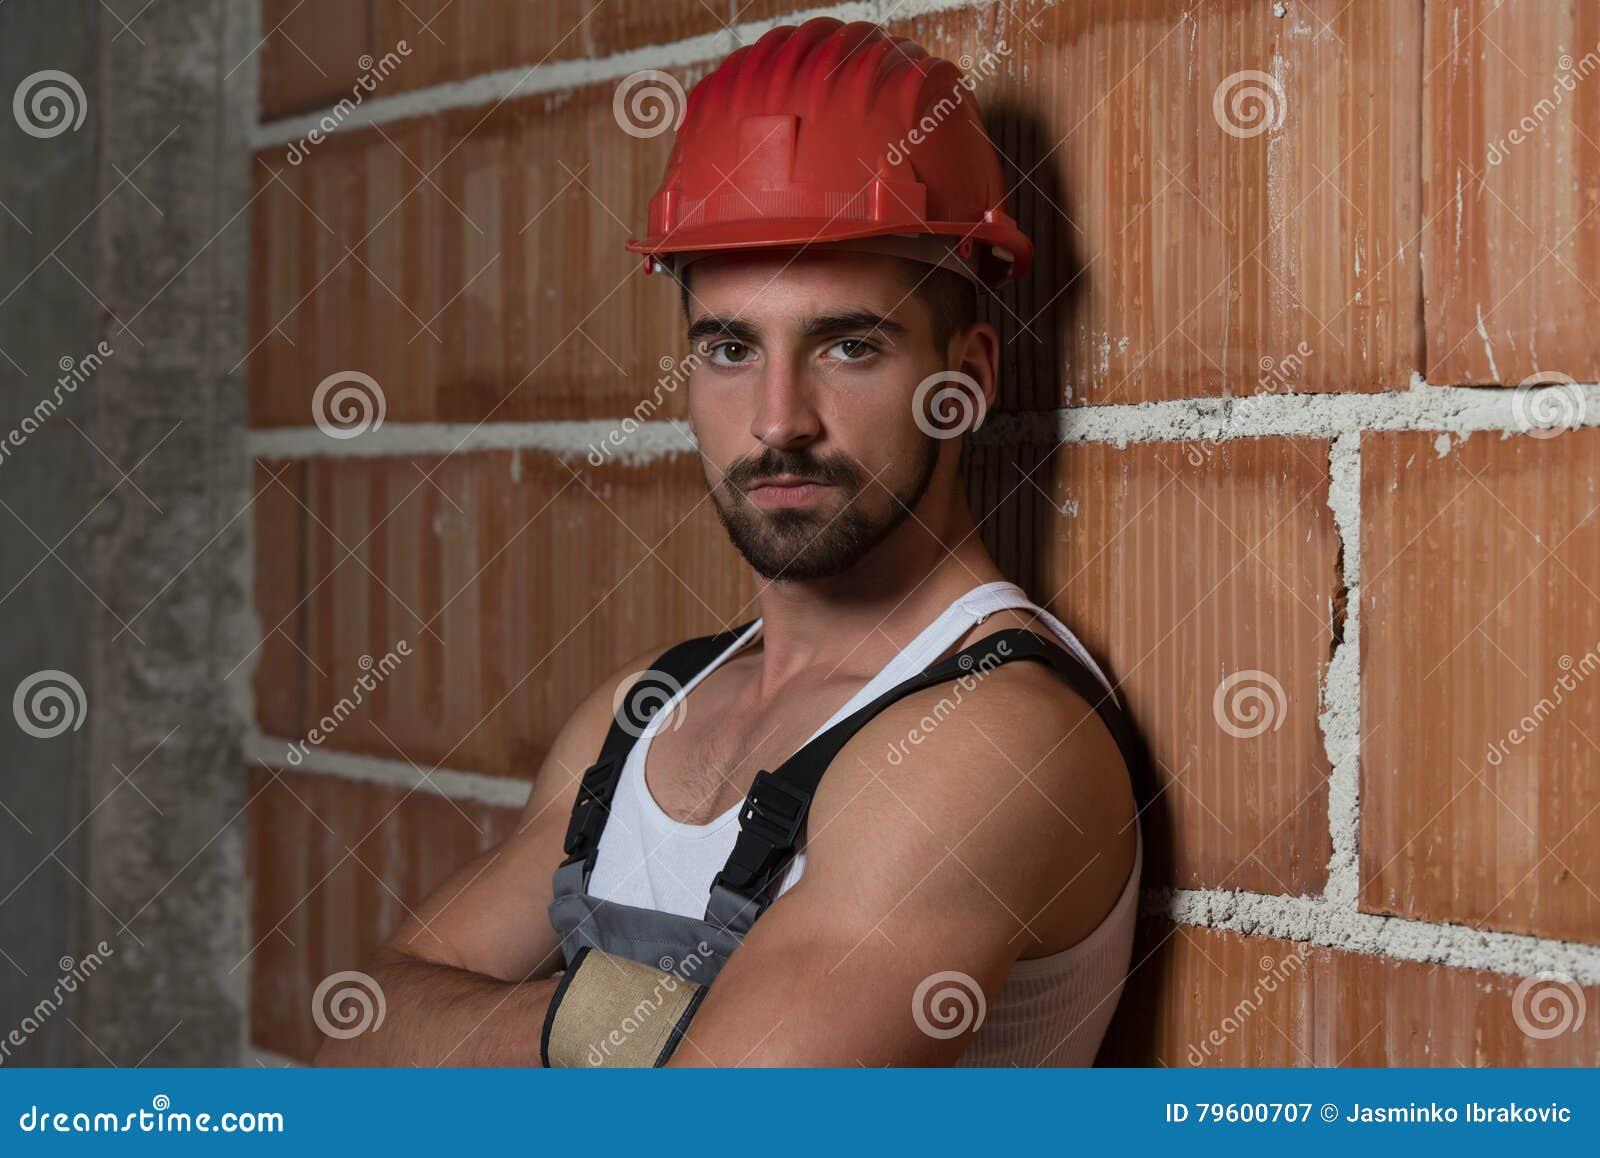 Coordenador Construction Wearing um capacete vermelho